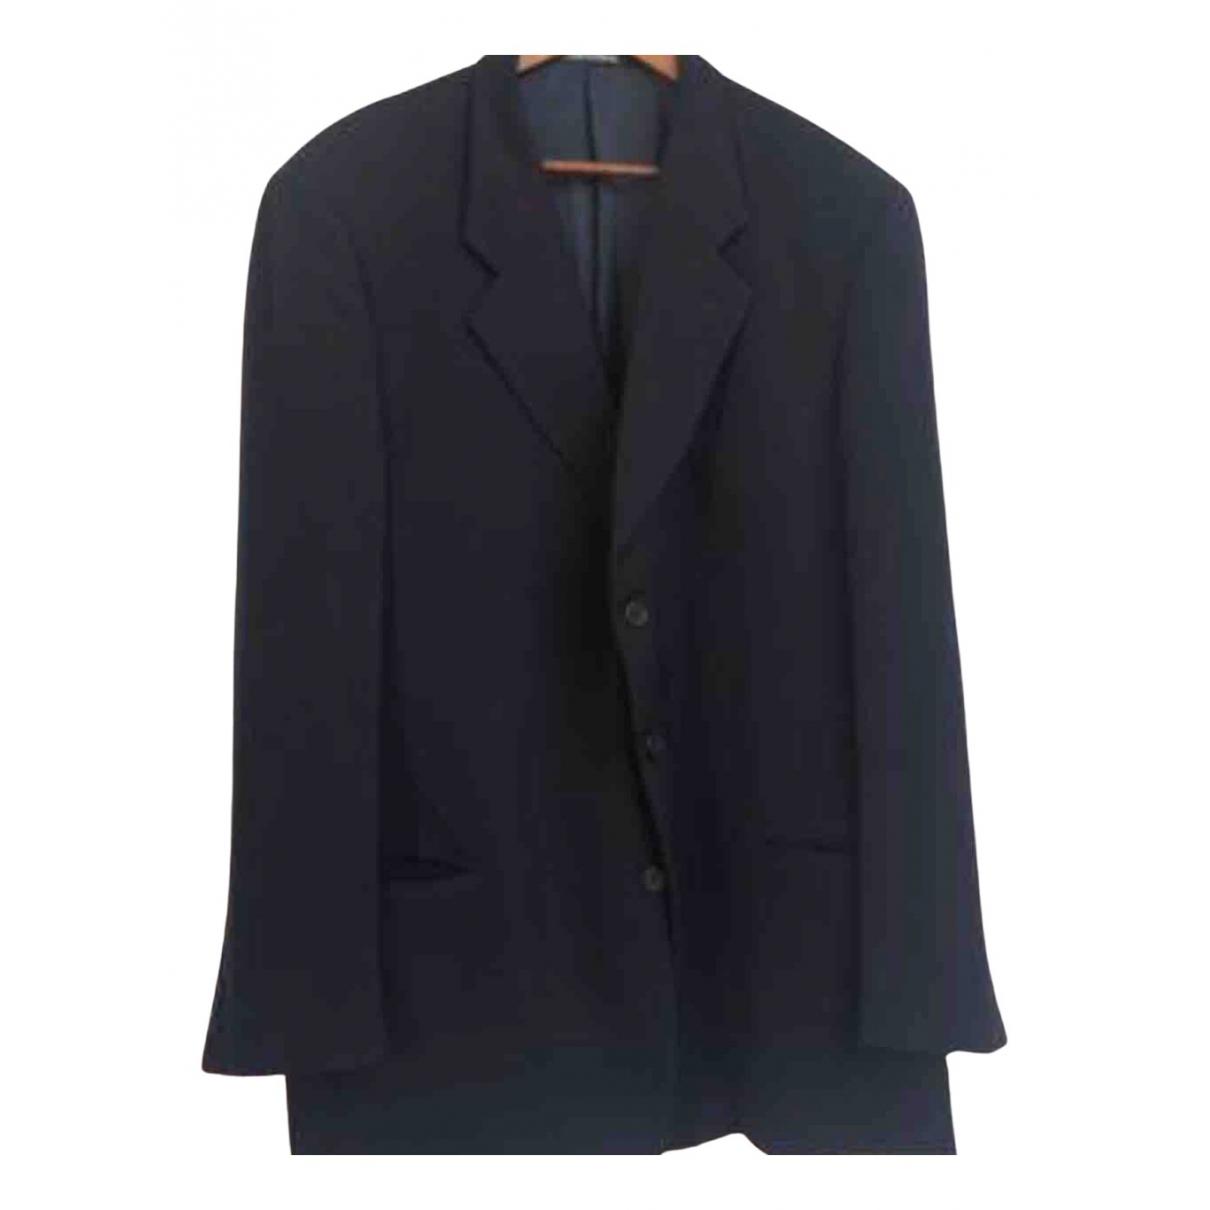 Armani Collezioni \N Black Wool jacket  for Men XL International